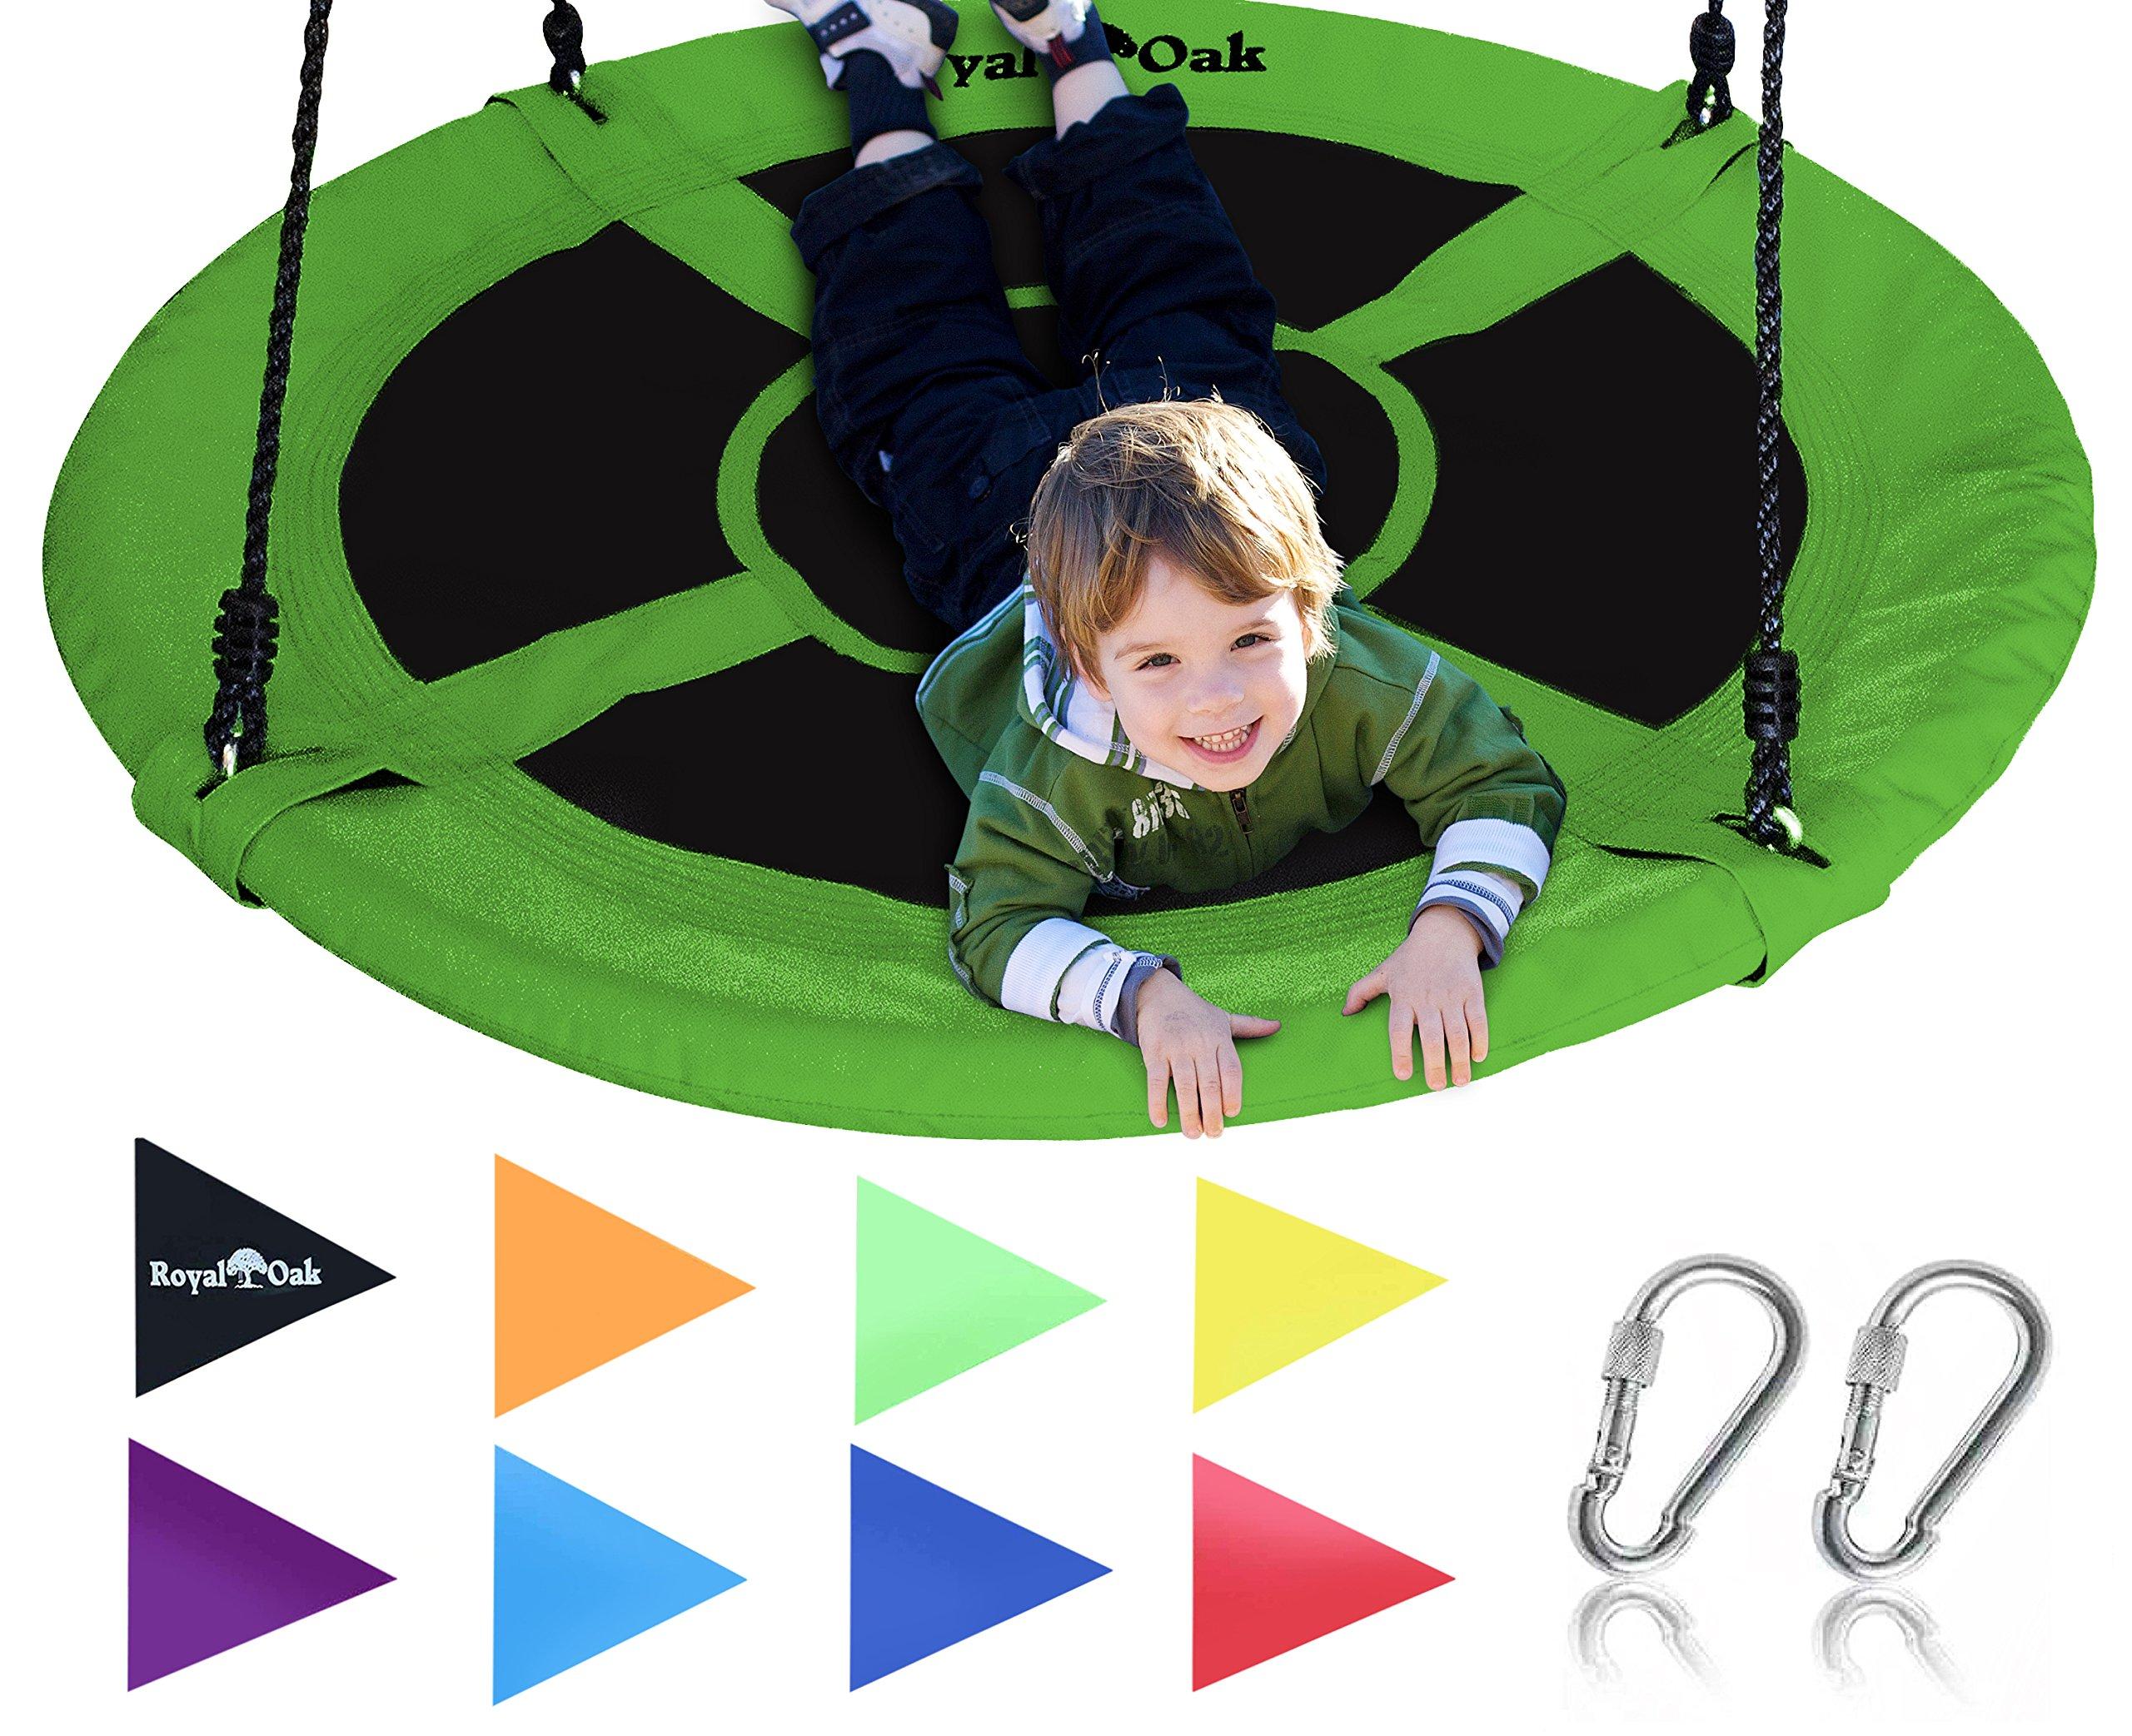 Royal Oak Giant 40'' Flying Saucer Tree Swing, Bonus Flags, 700 lb Weight Capacity, Easy Install, Steel Frame